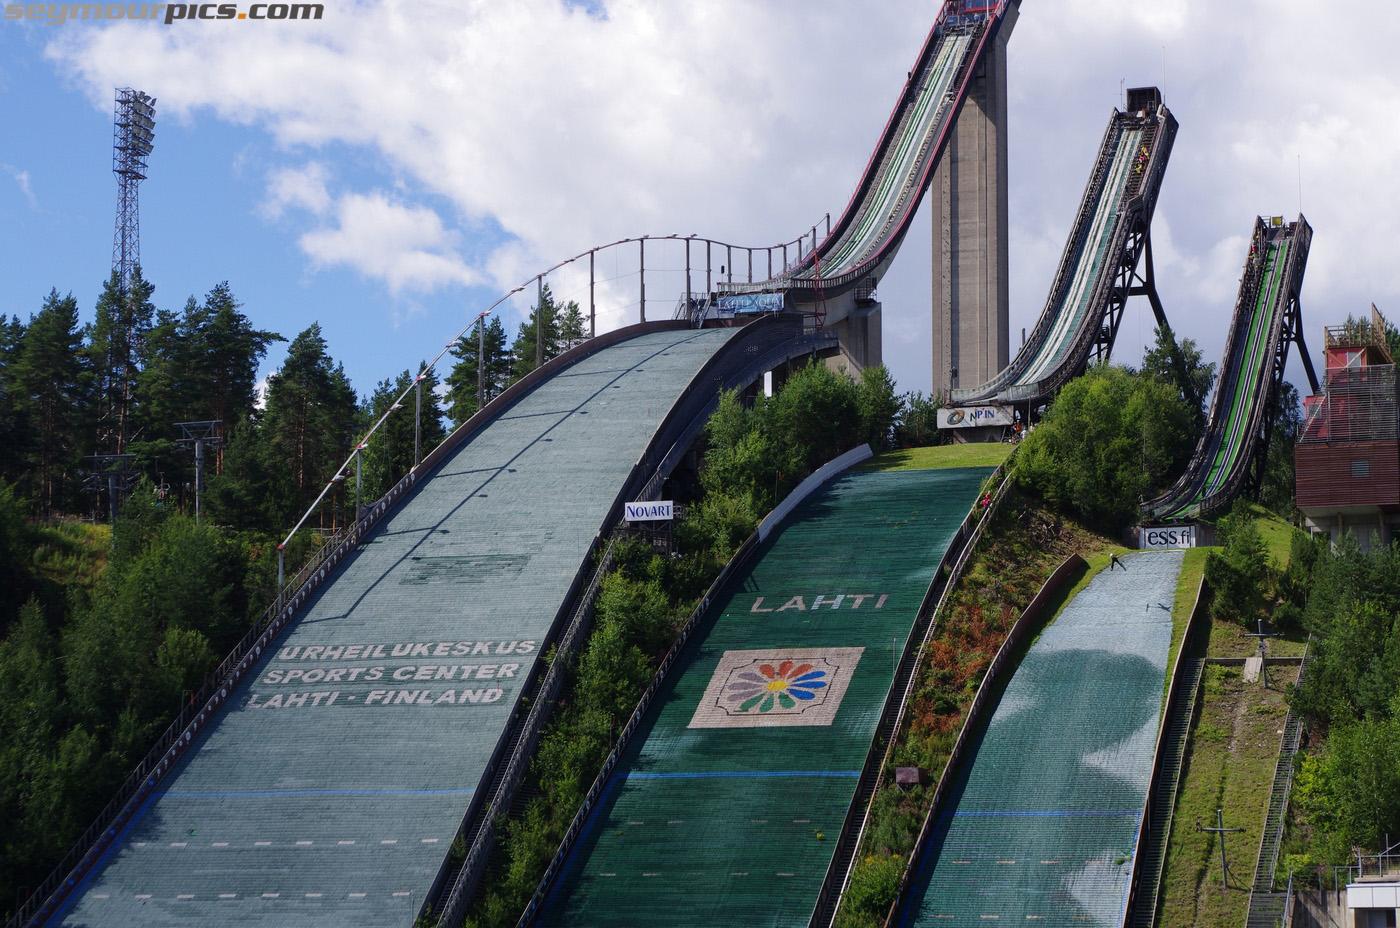 seymourpics-wallpaper-finland-lahti-skijumps_1400px.jpg